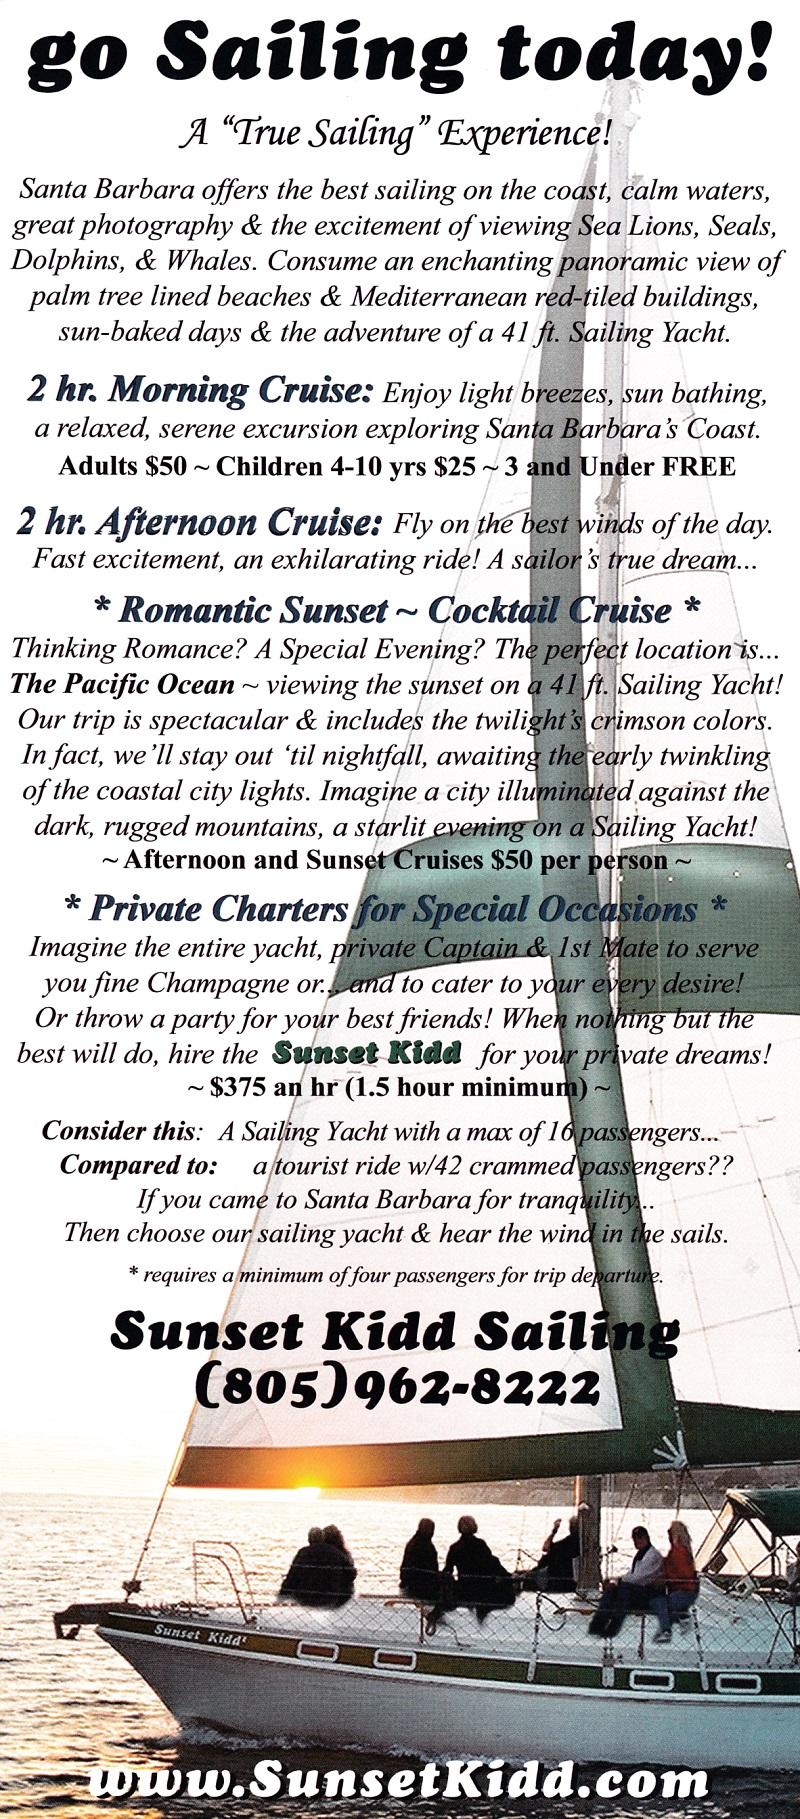 Sailboat Cruises brochure thumbnail